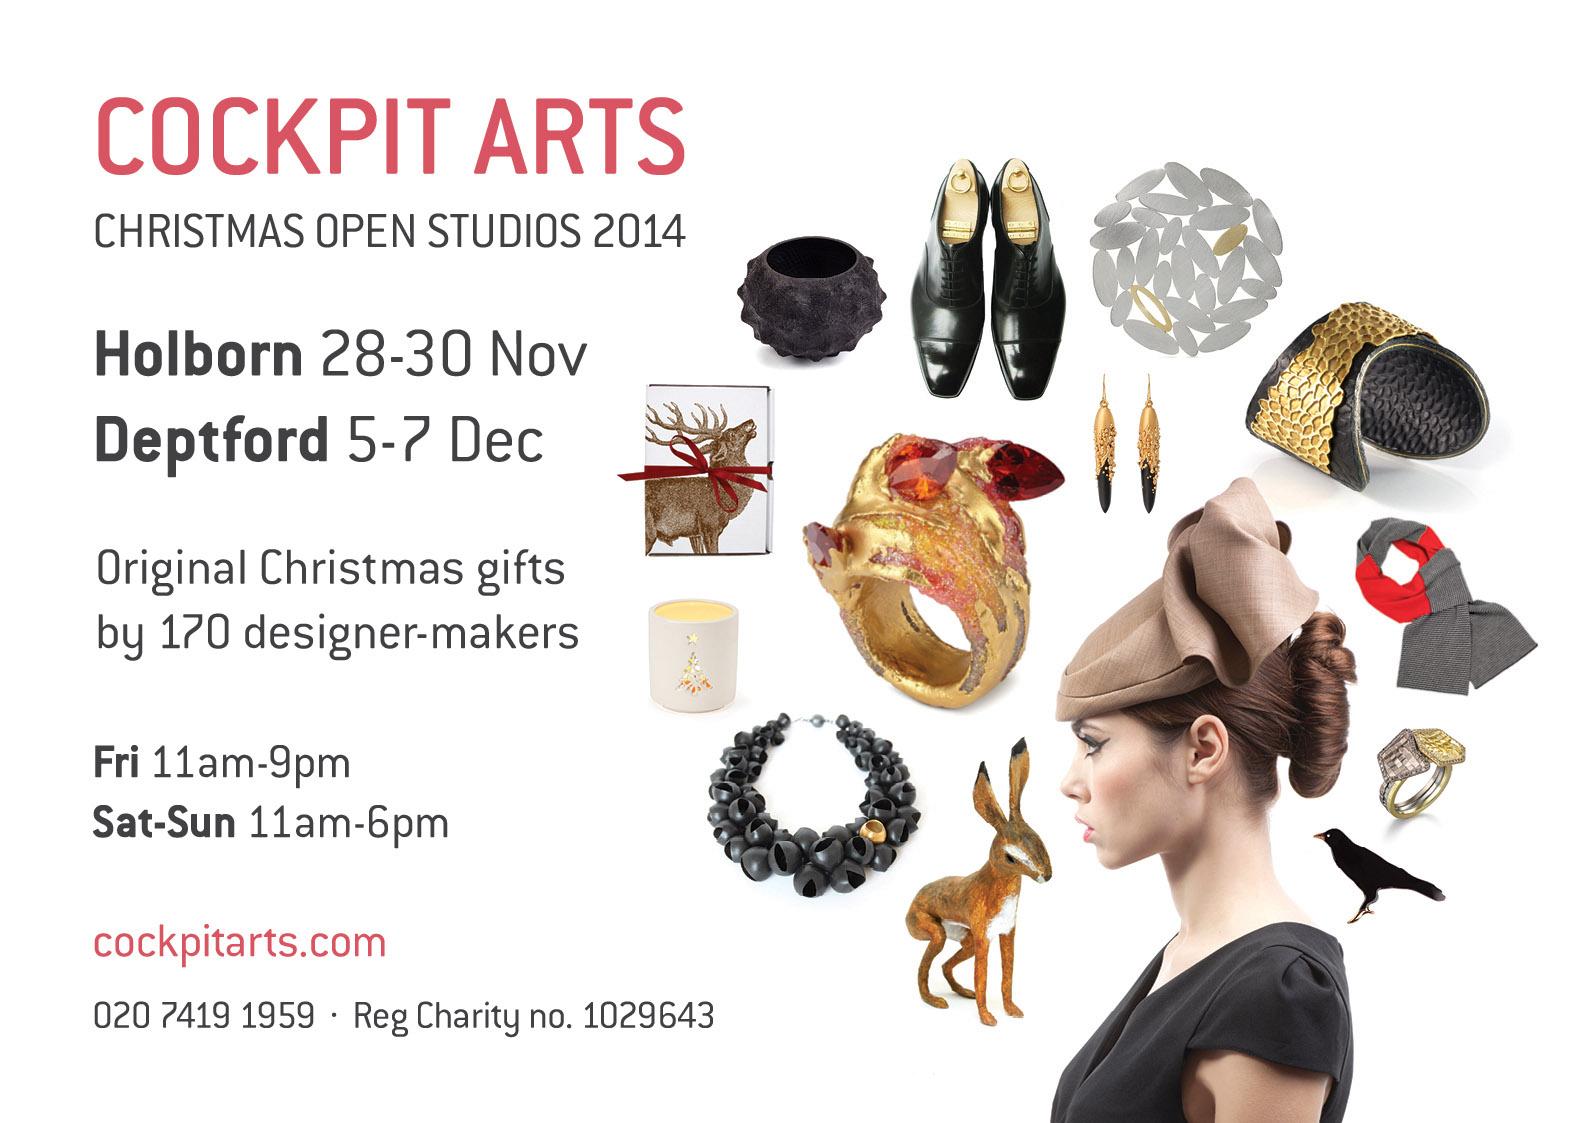 Cockpit Arts Christmas Open Studios invitation 2014